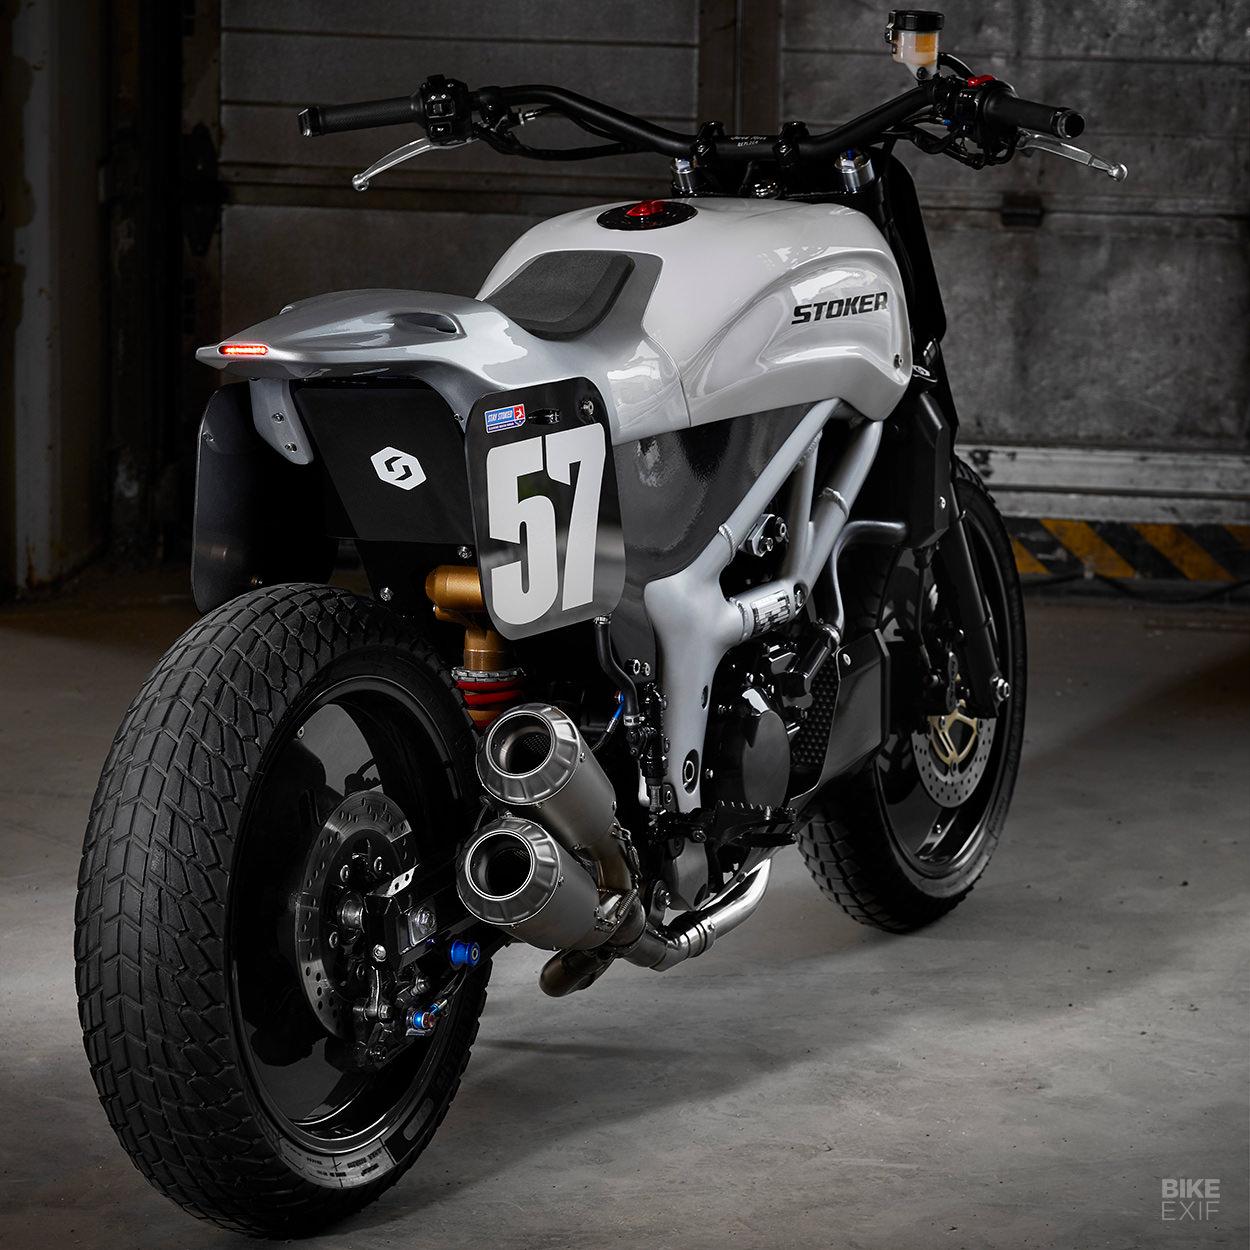 Suzuki SV650 street tracker by Stoker Motorcycles